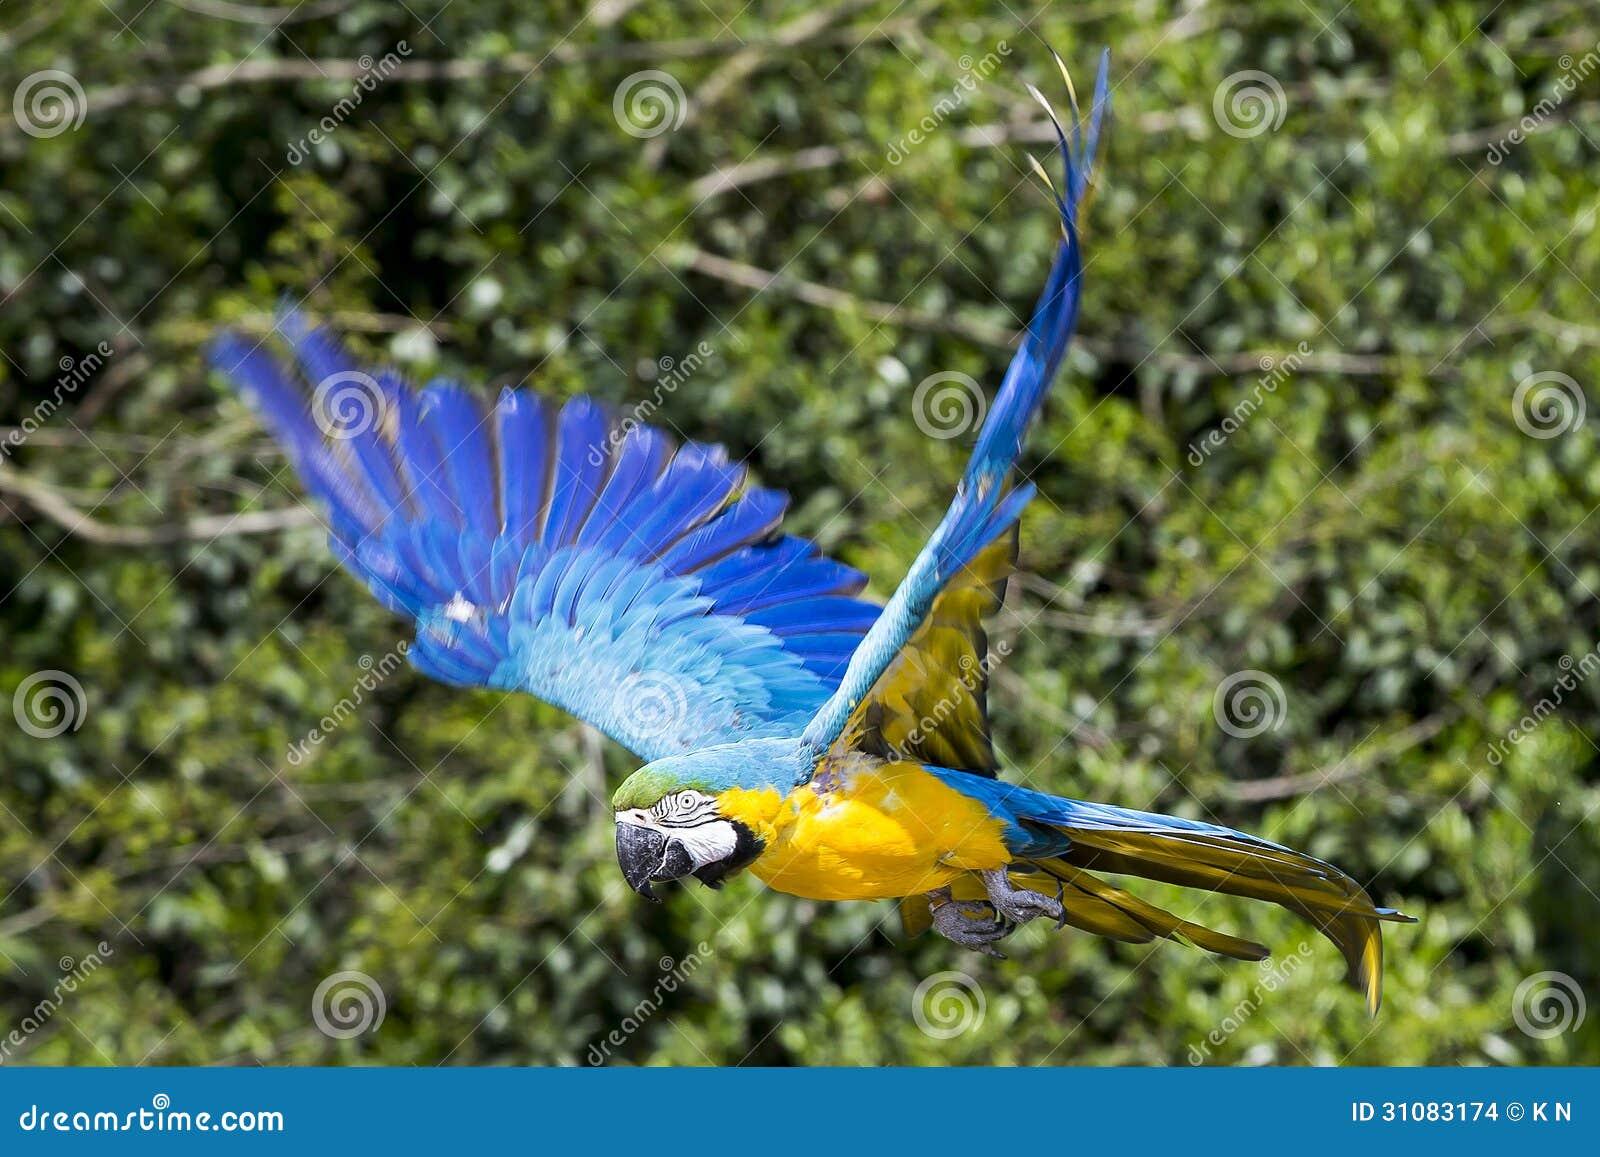 blue jay in flight - Google Search | Blue jay bird, Flying ... |Blue Macaw Parrot Flying